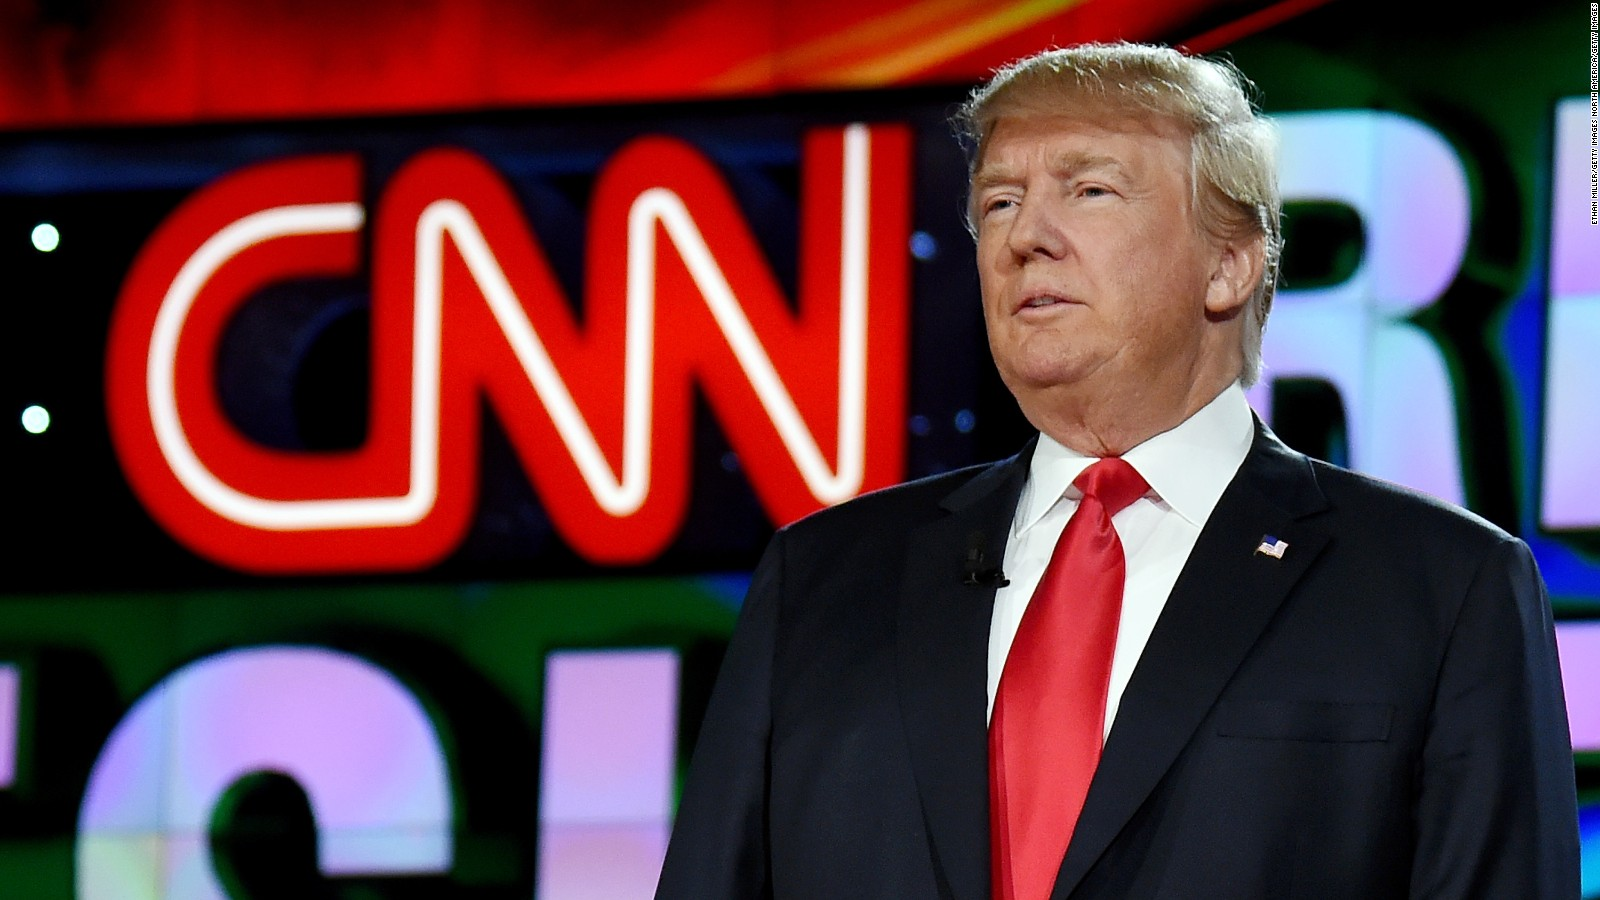 Trump CNN'i dövdü